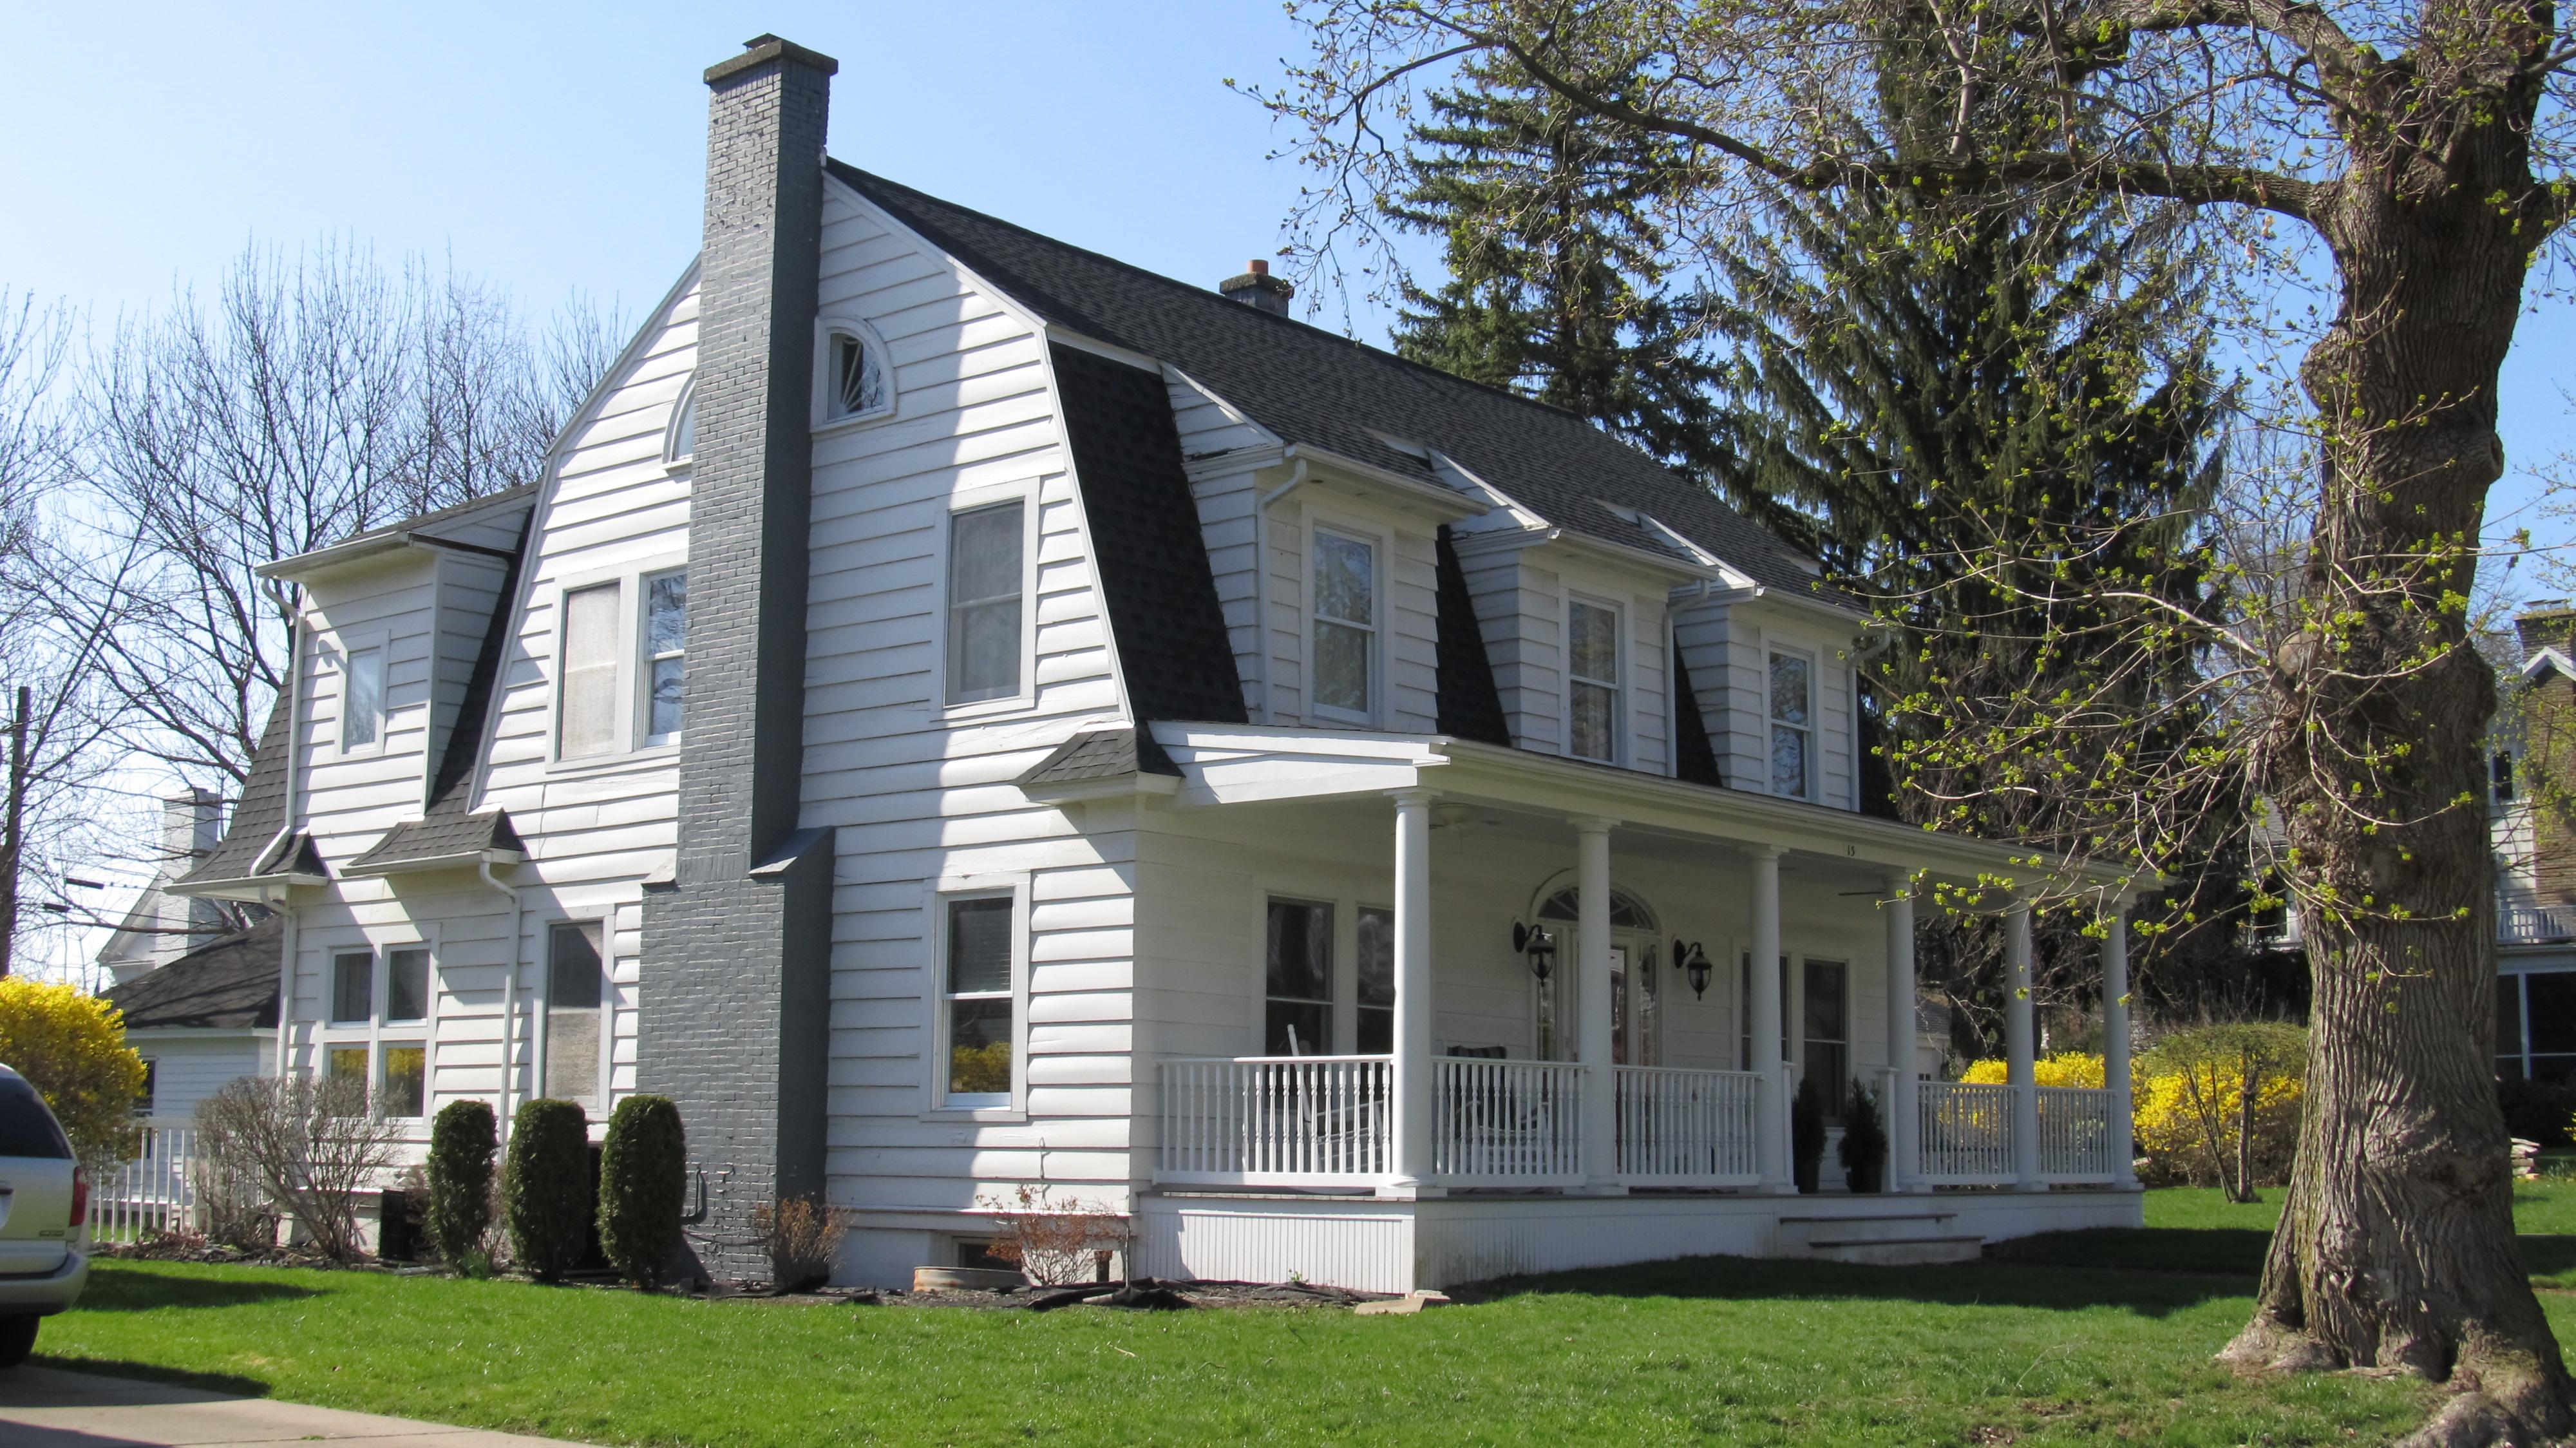 13 Avon Road, Binghamton, New York 13905